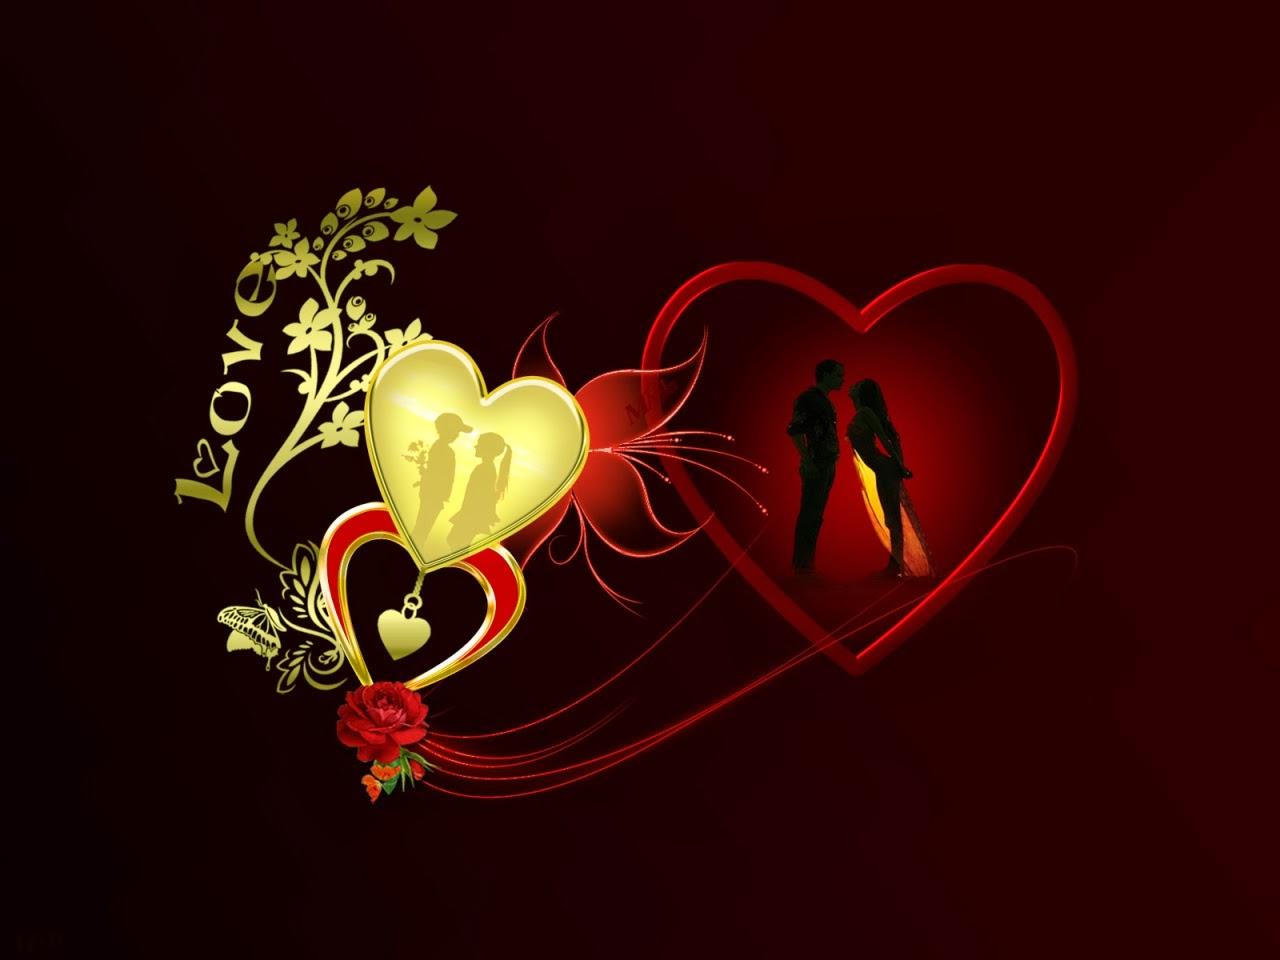 بالصور صور عبارات حب , اجمل صور عبارات الحب الجميله 230 5